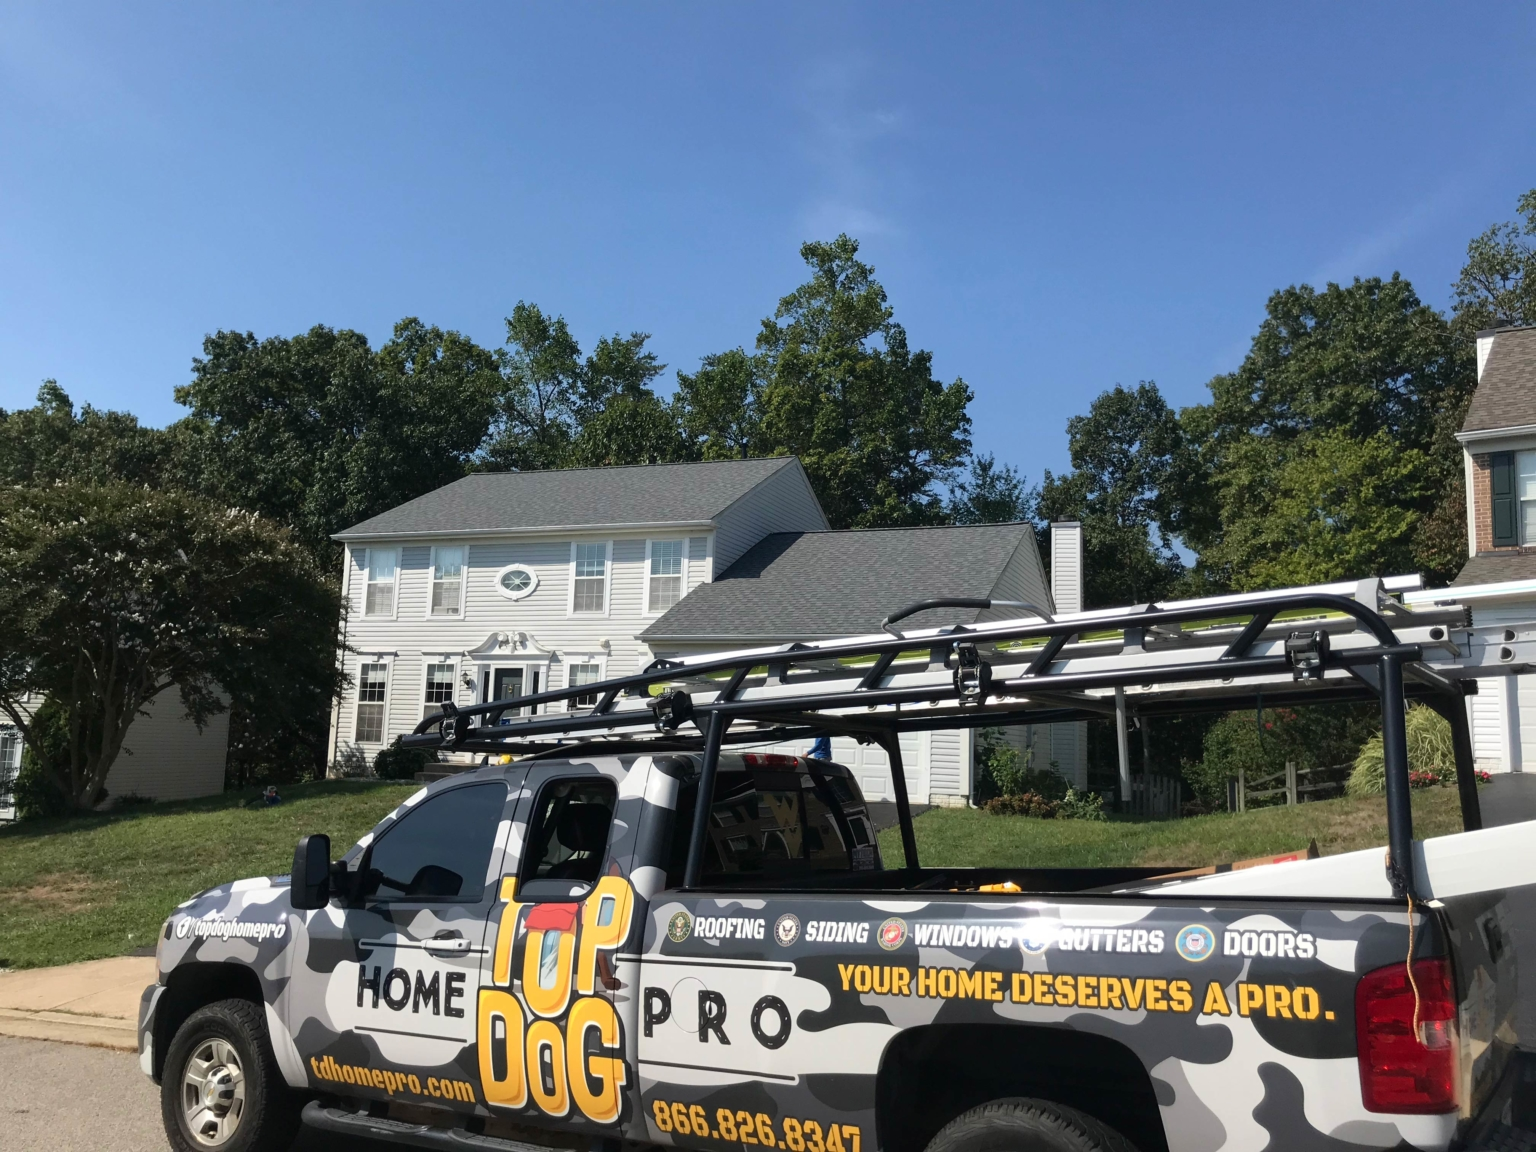 Top Dog Home Pro roofing replacement SPECIALISTS woodbridge va